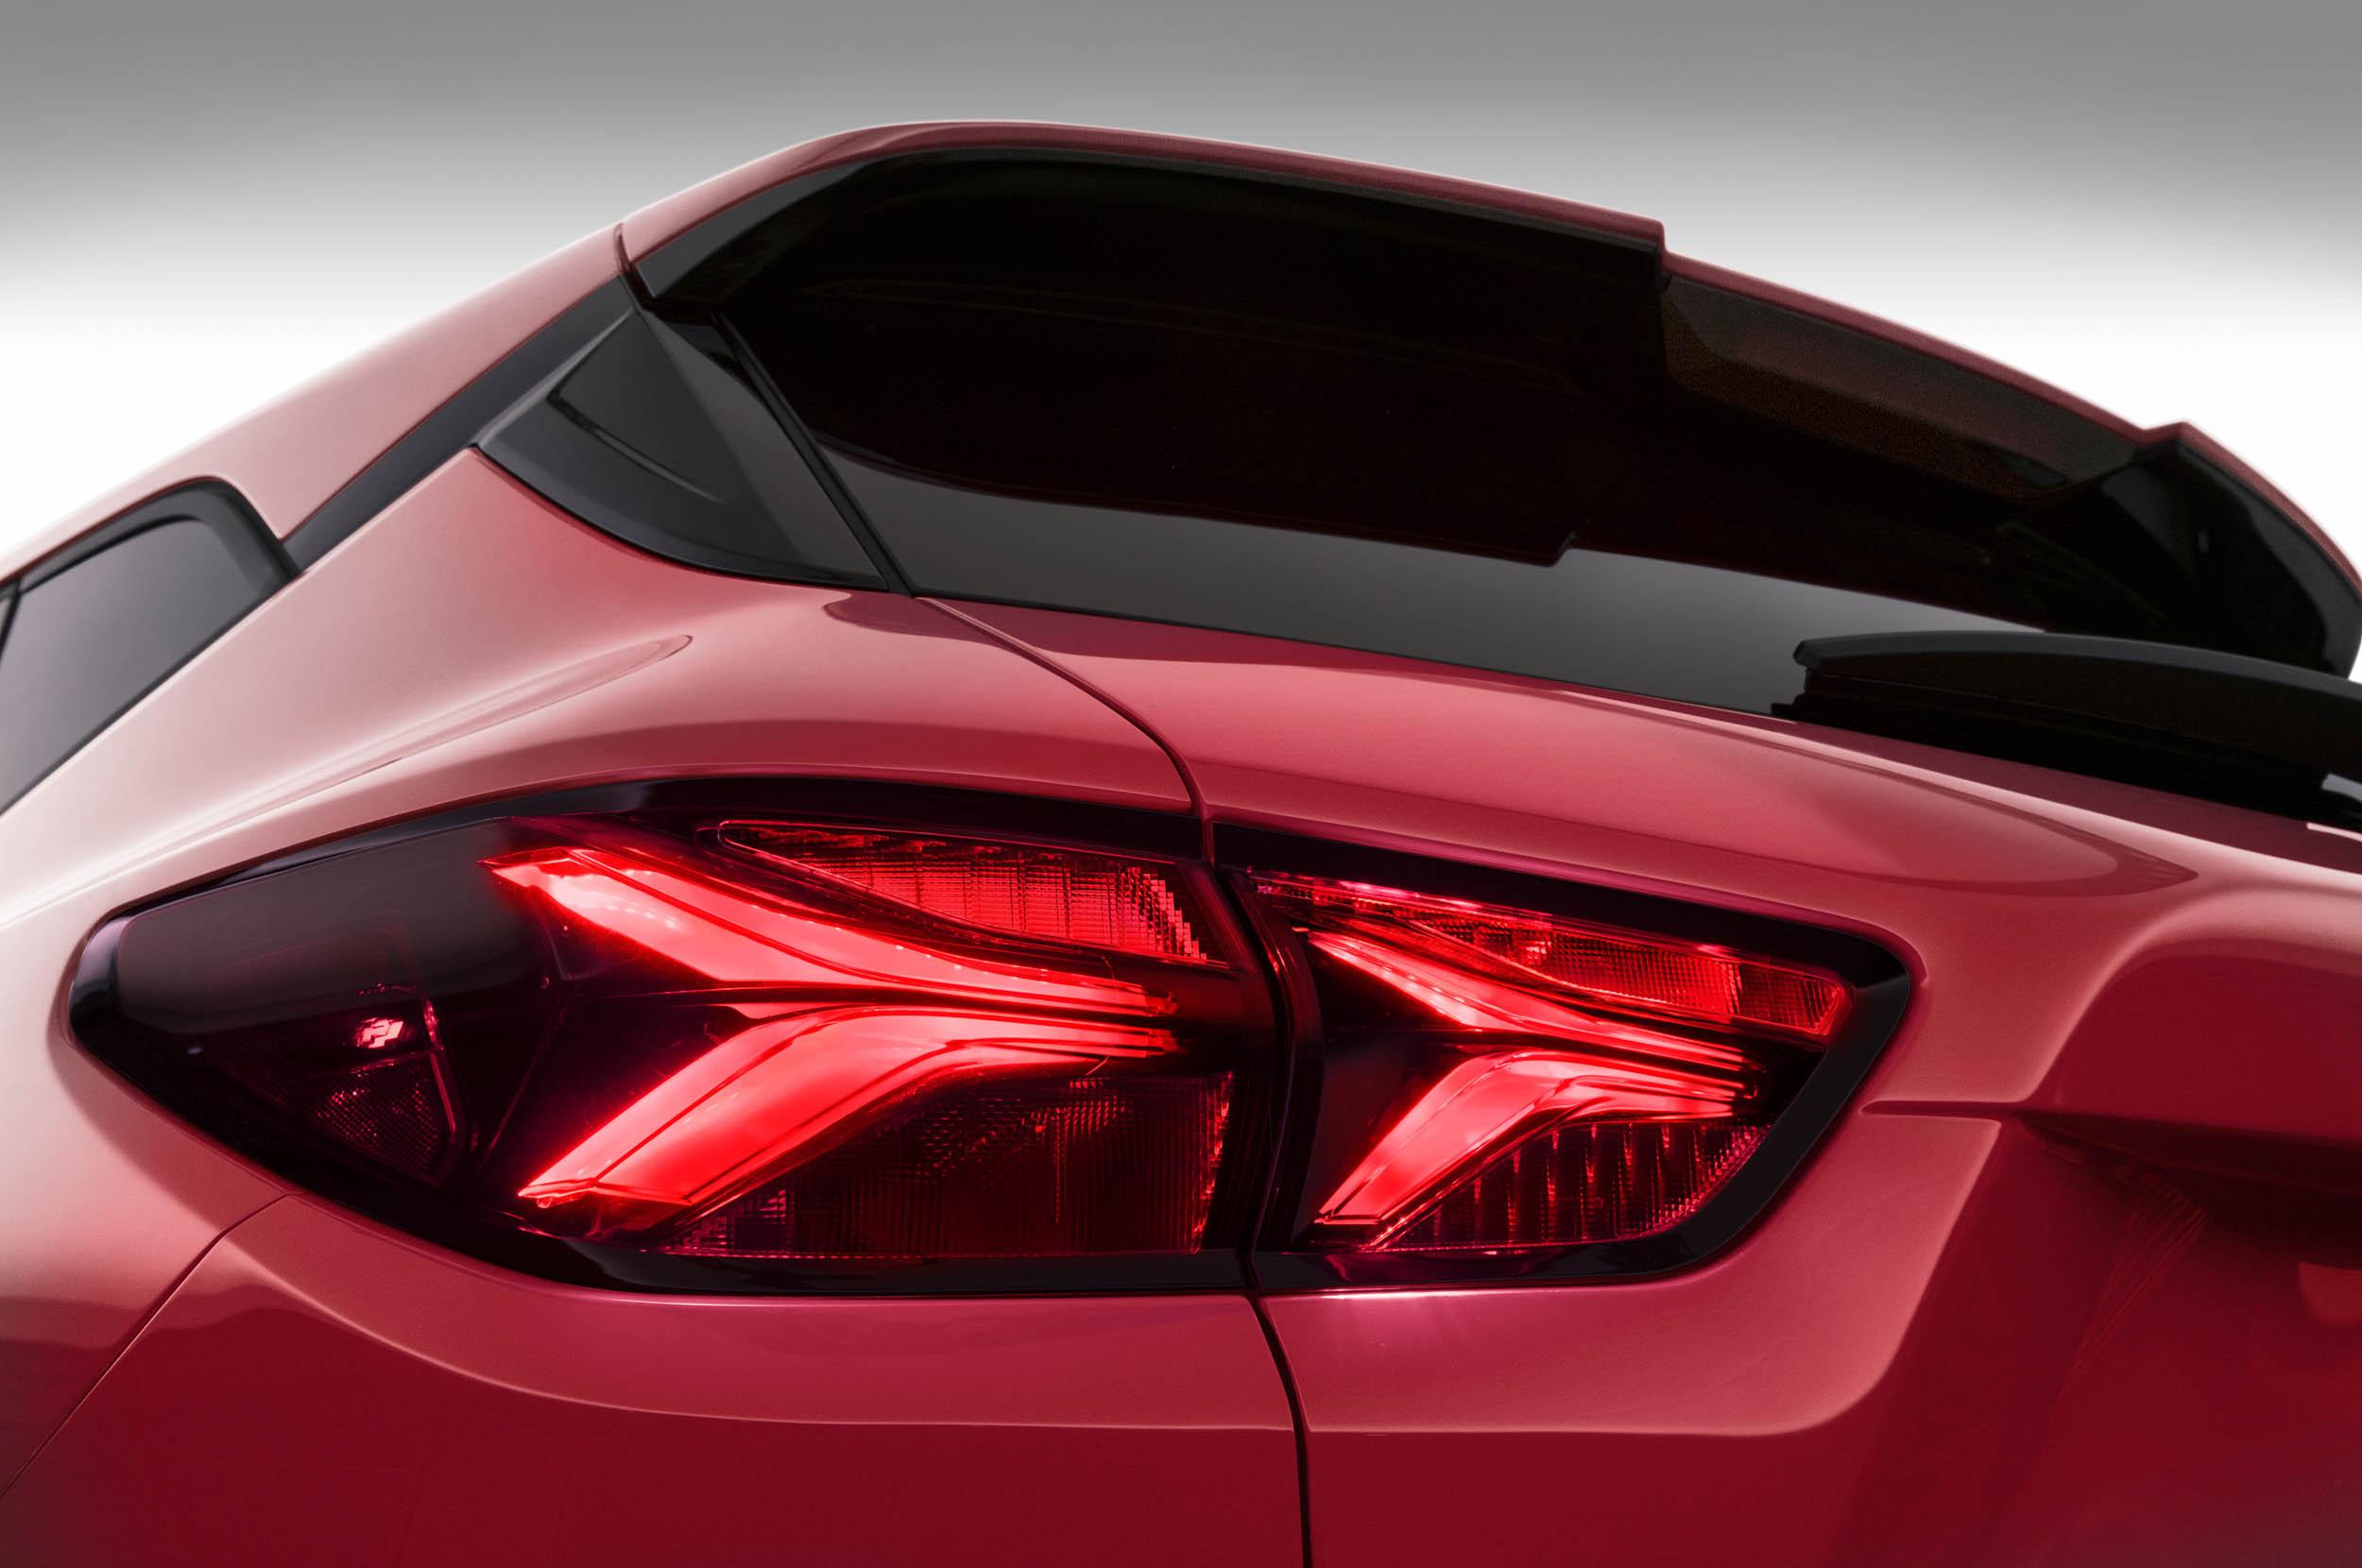 2019 Chevrolet Blazer tail light